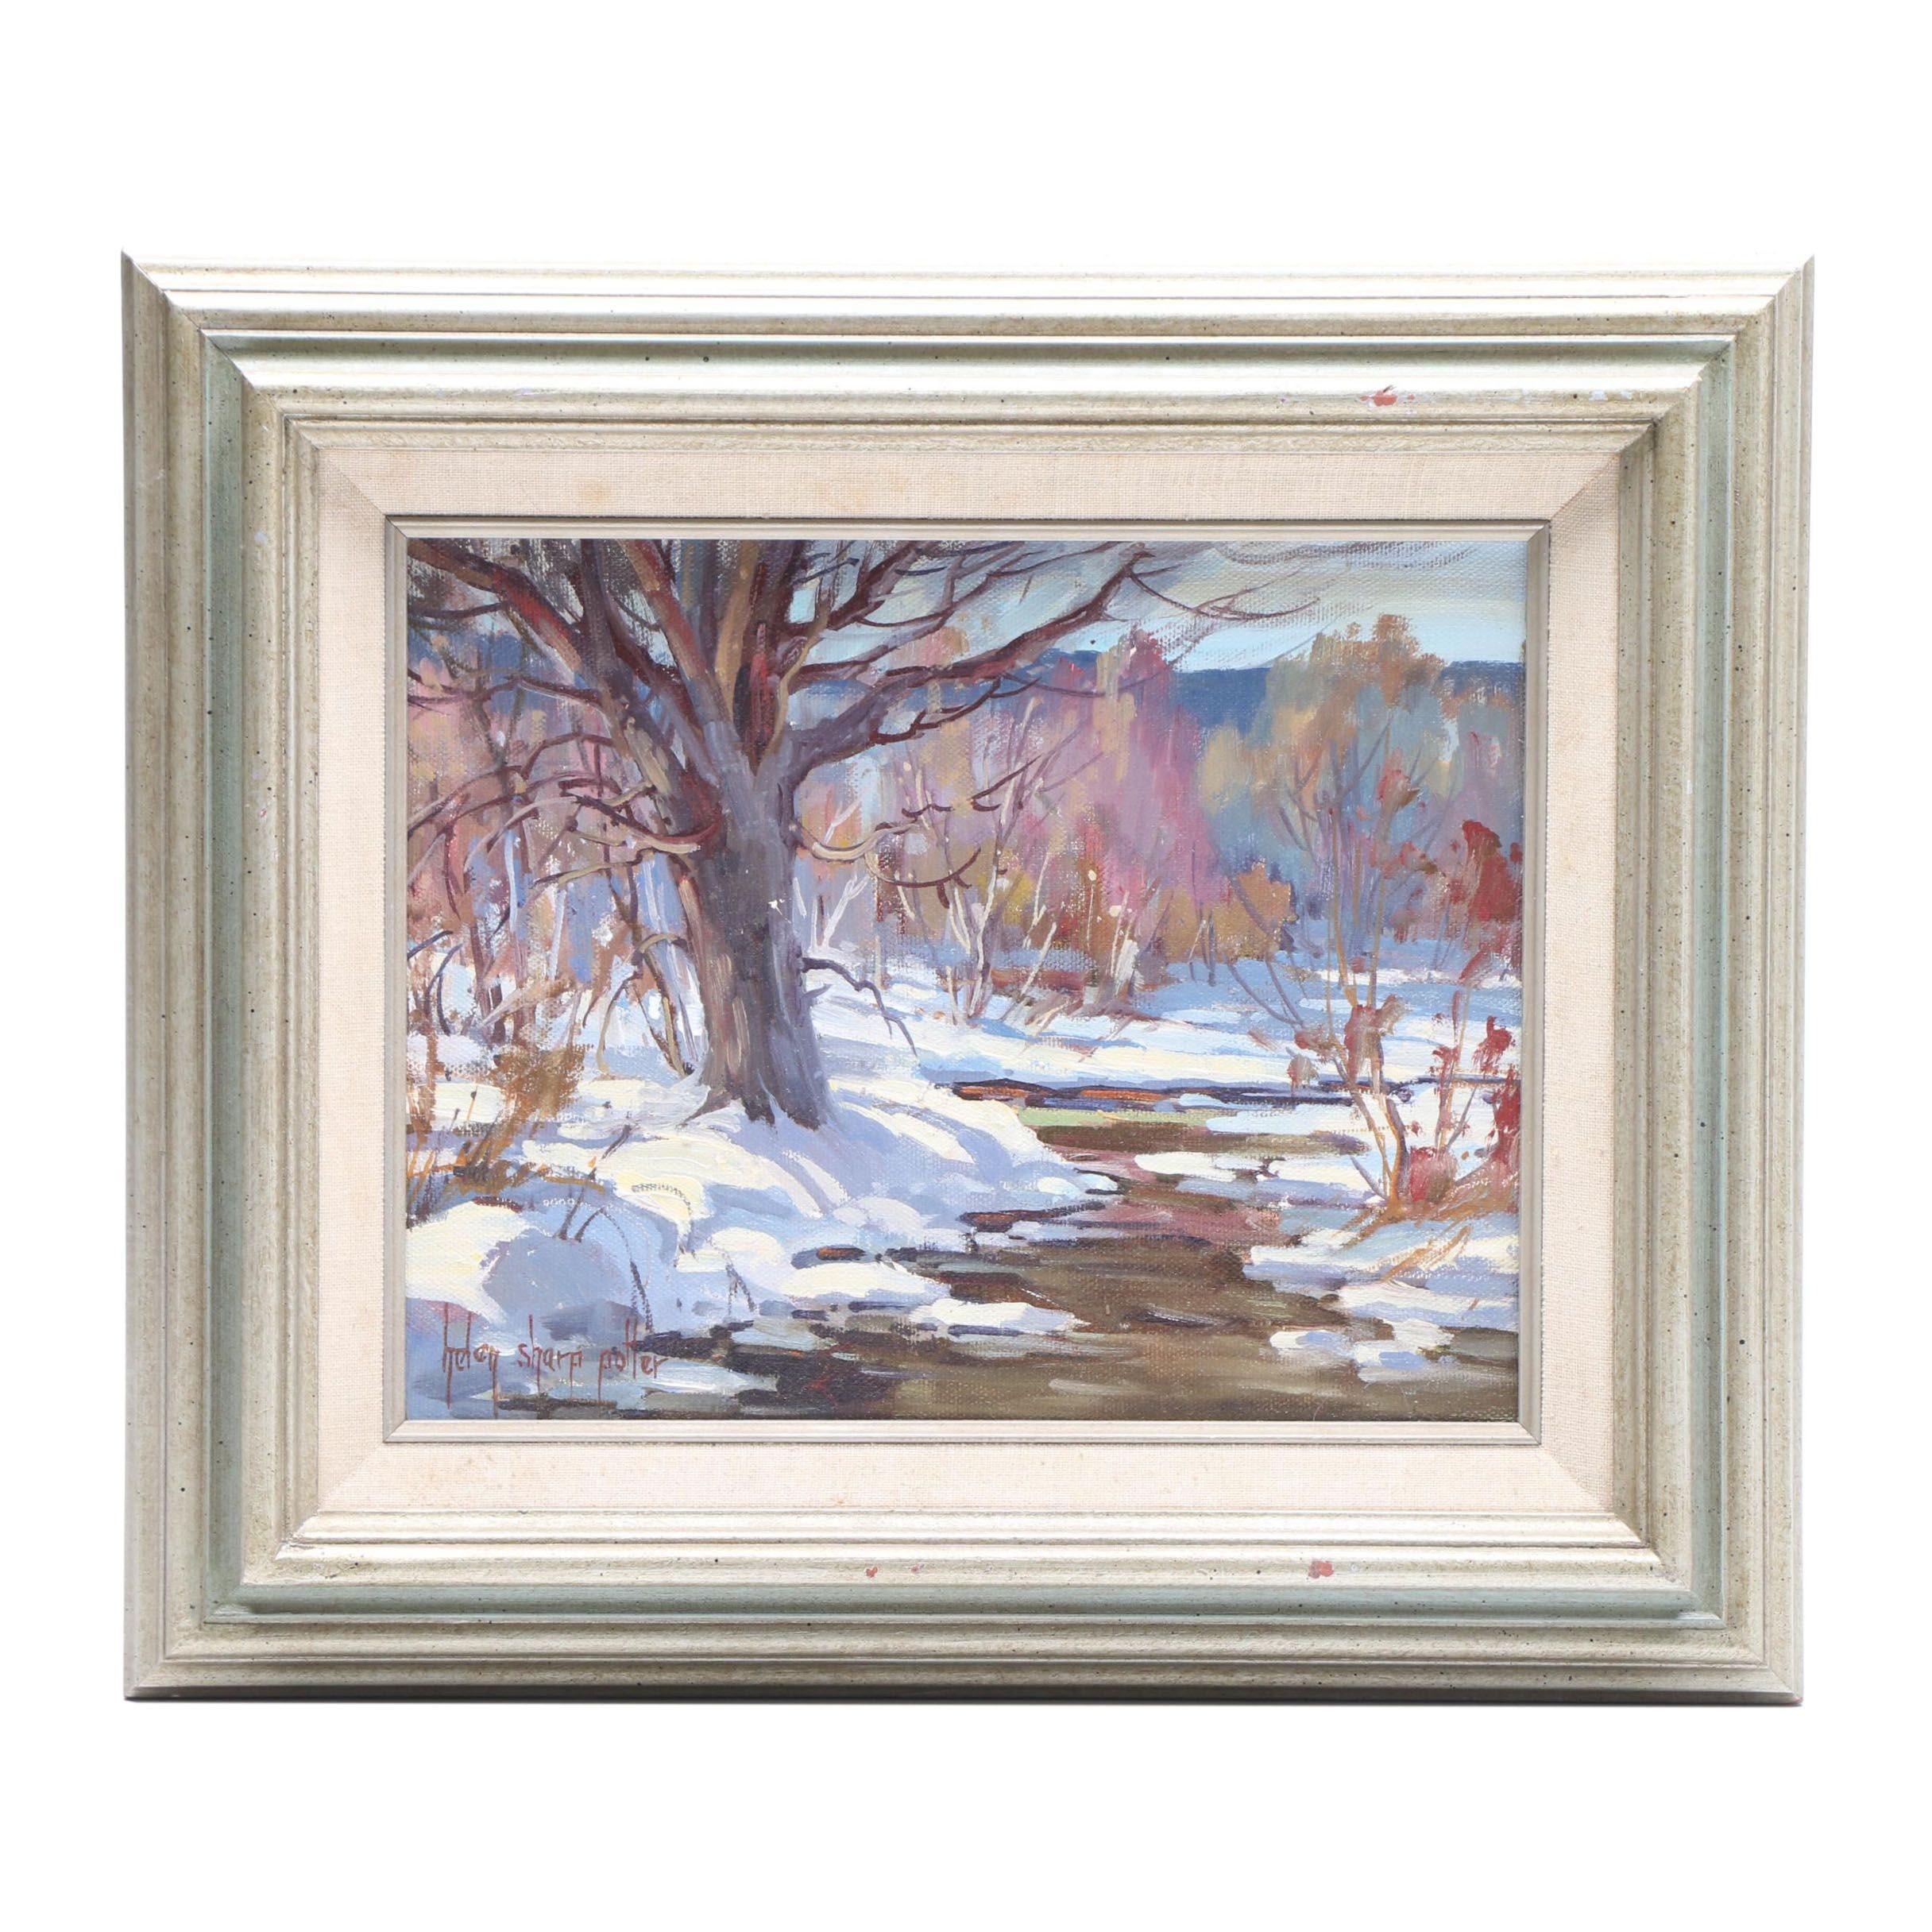 "Helen Sharp Potter Oil Landscape Painting ""Winter Brook"""